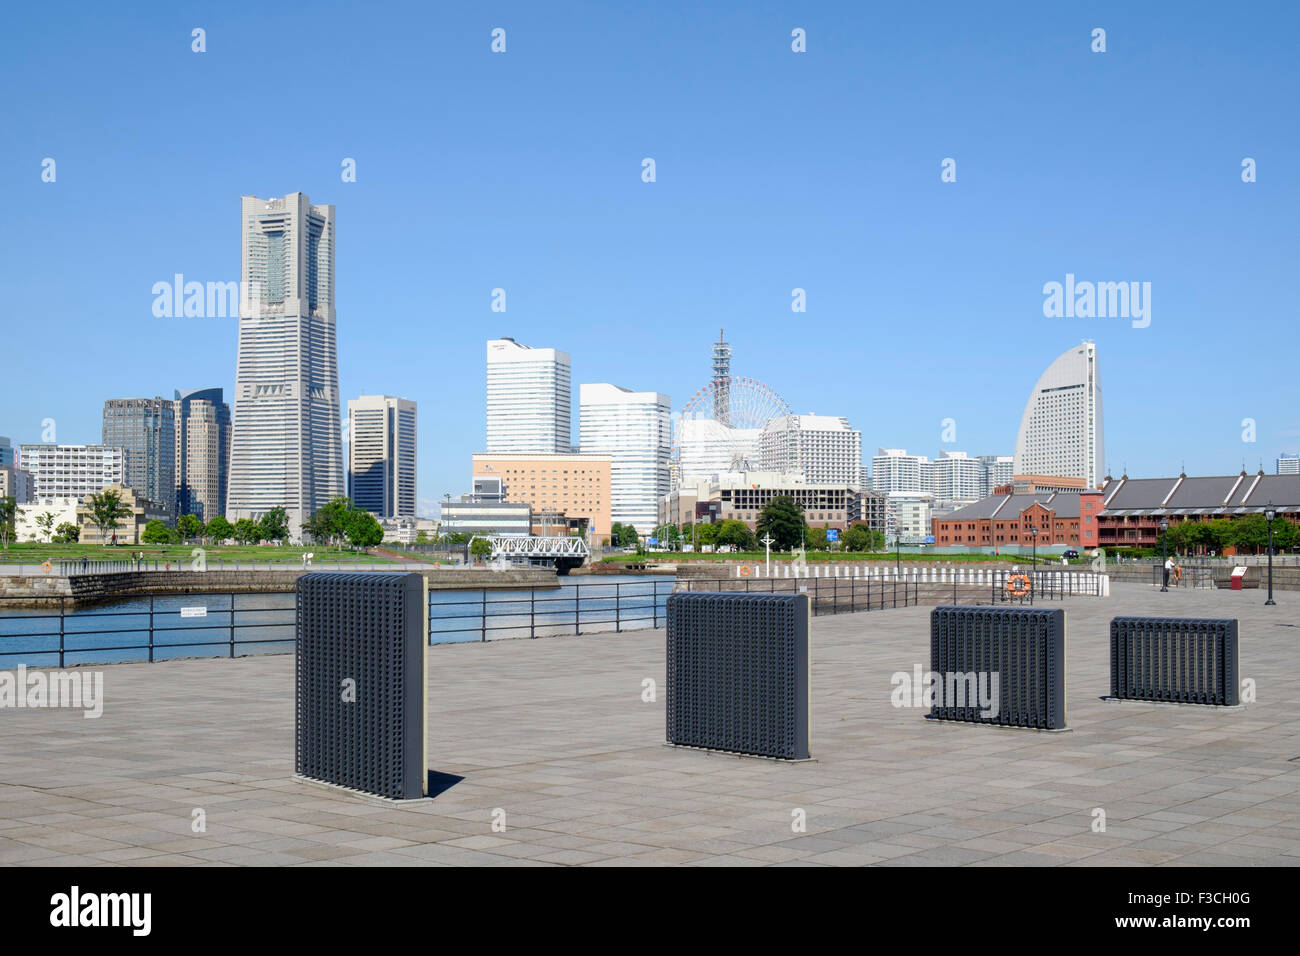 Skyline of modern Minato Mirai district of Yokohama in Japan - Stock Image